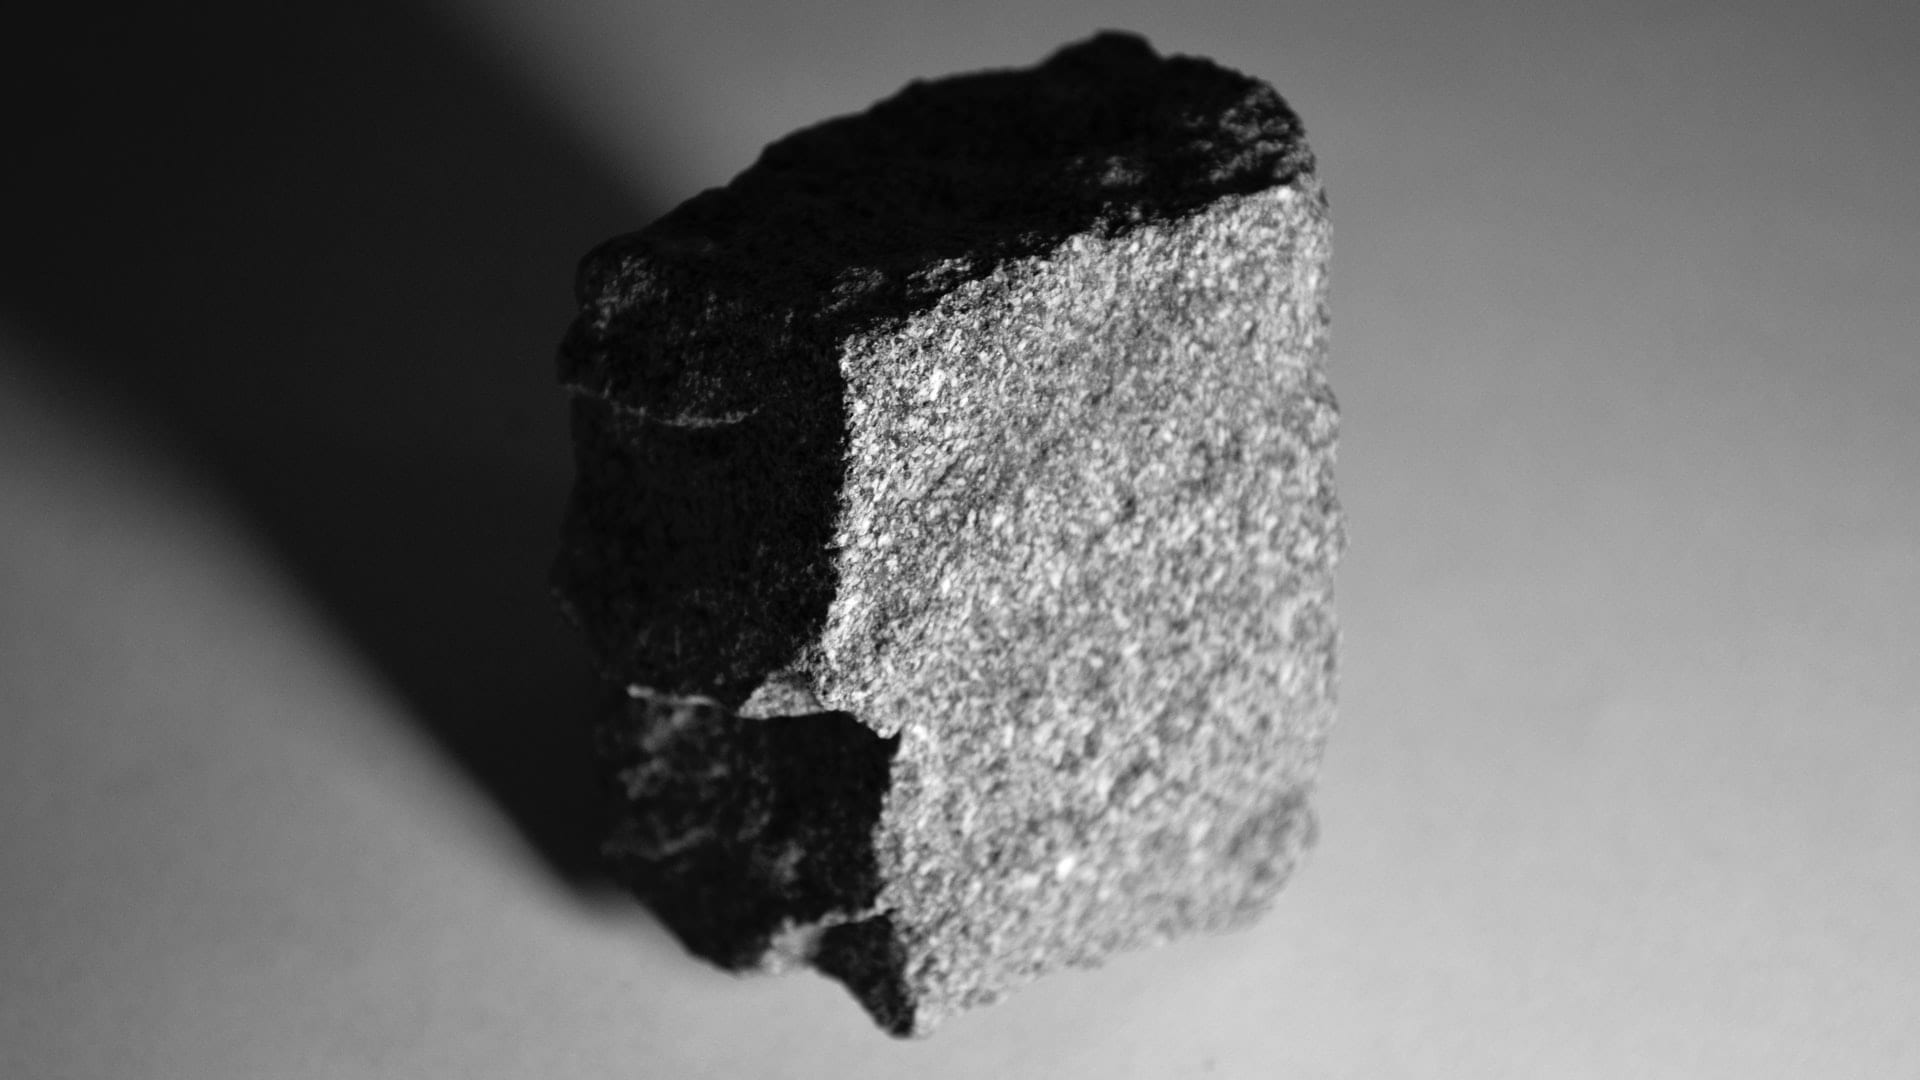 sharpening rock